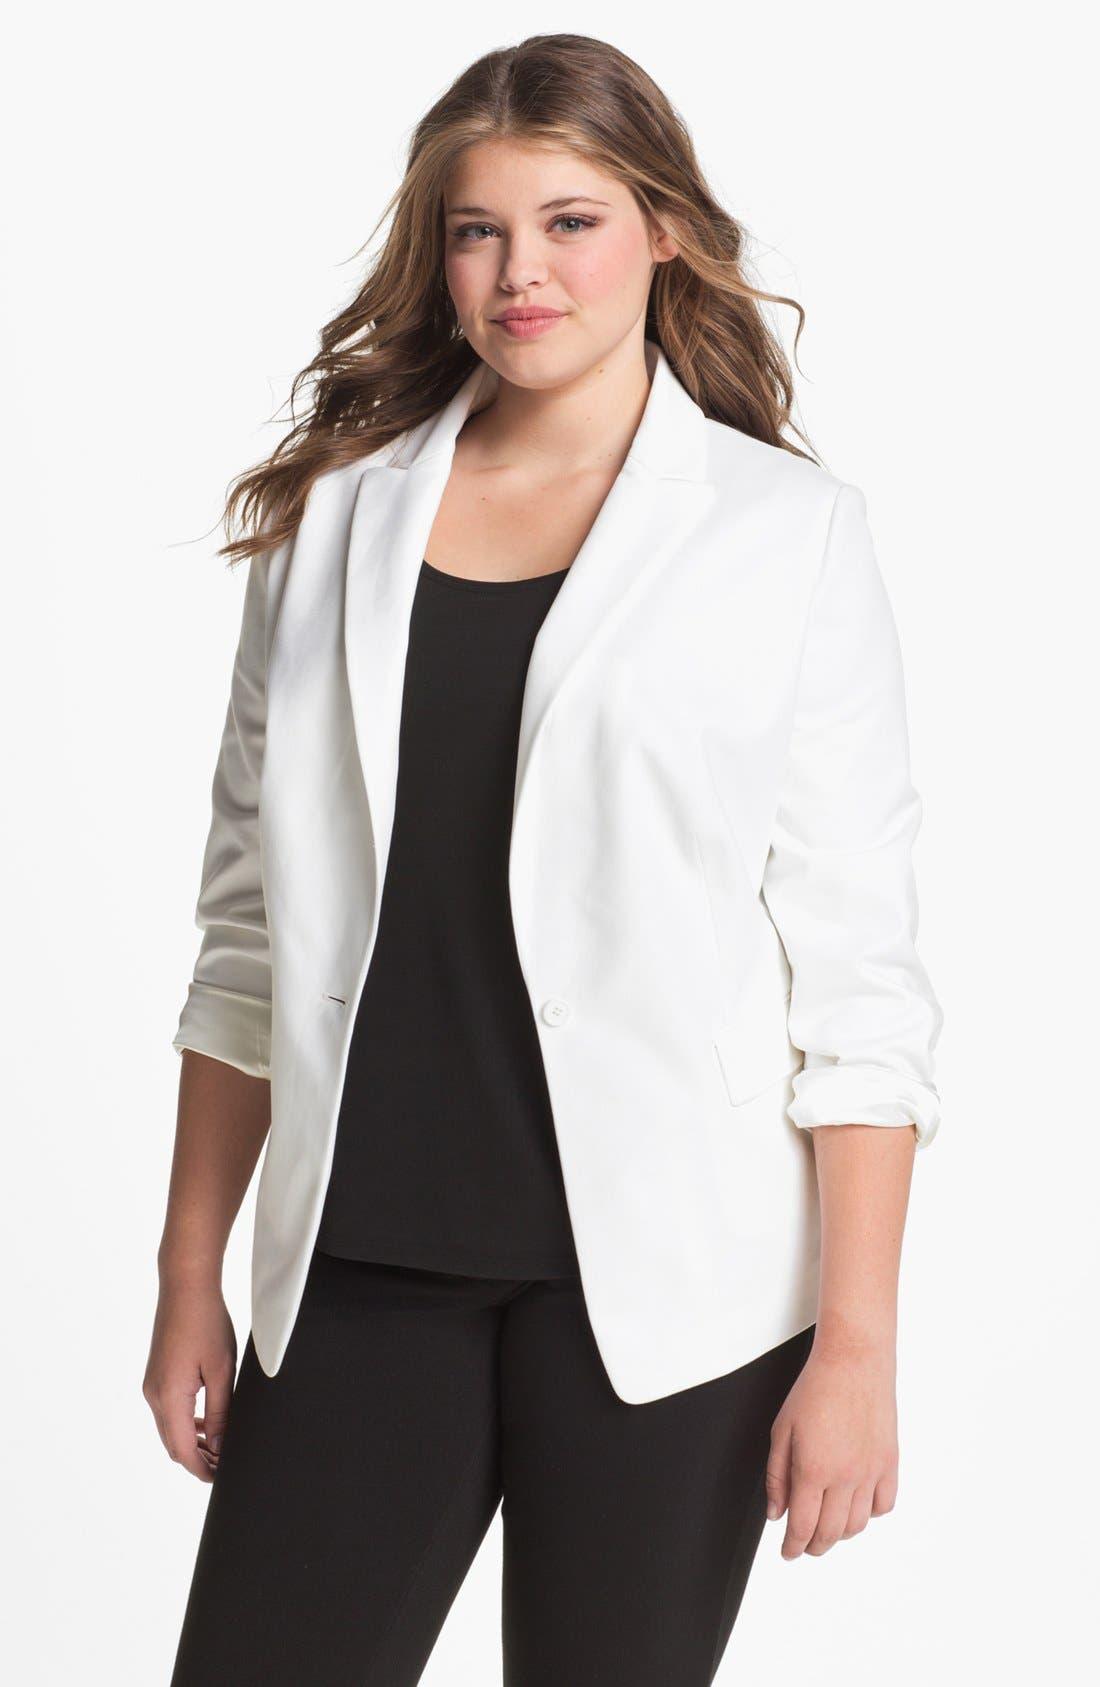 Alternate Image 1 Selected - Tahari Woman 'Carina' Jacket (Plus)